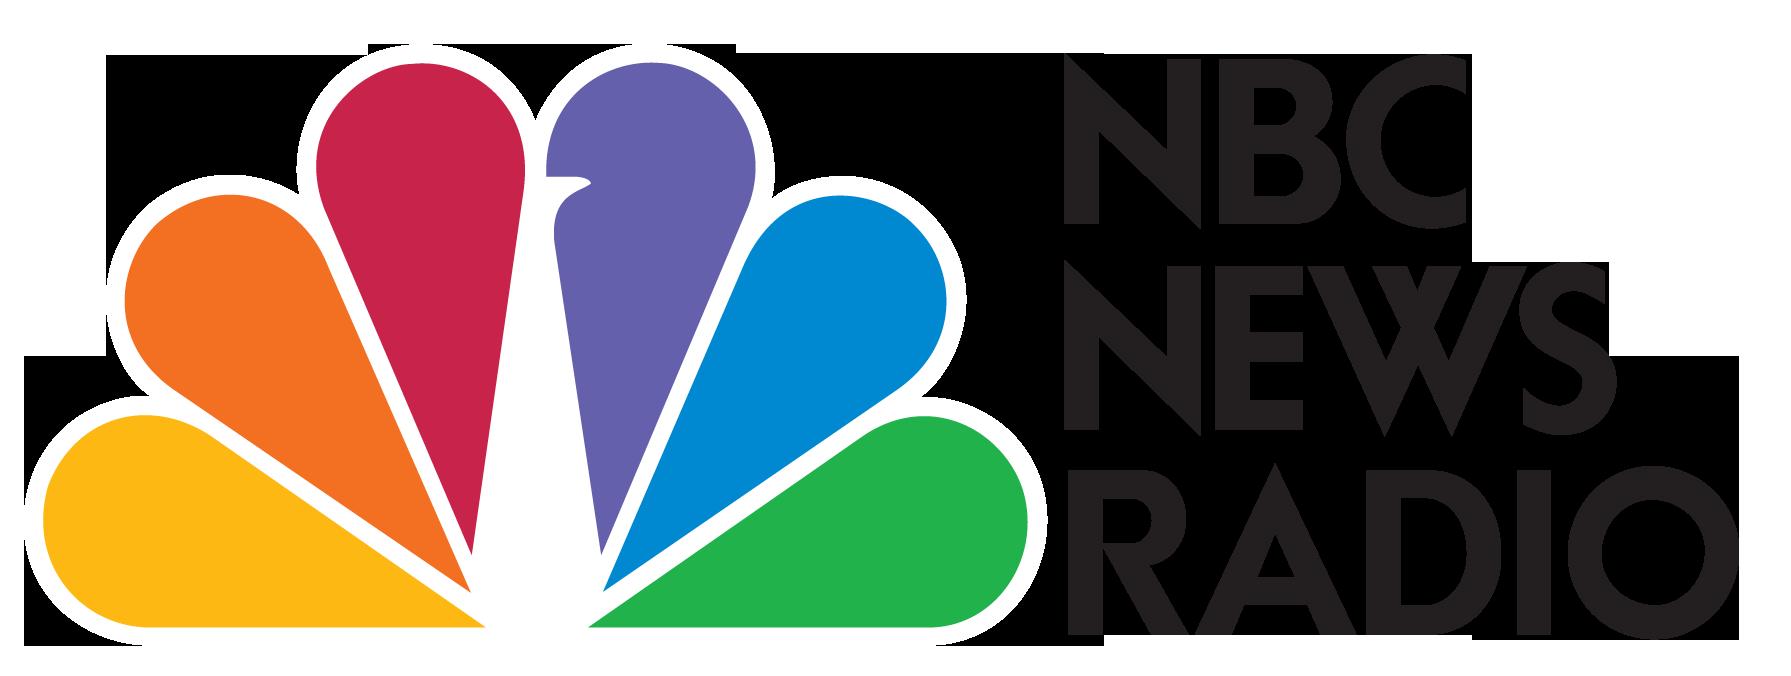 nbc logos WAKO 103.1 FM and 910 AM Nbc news, Nbc